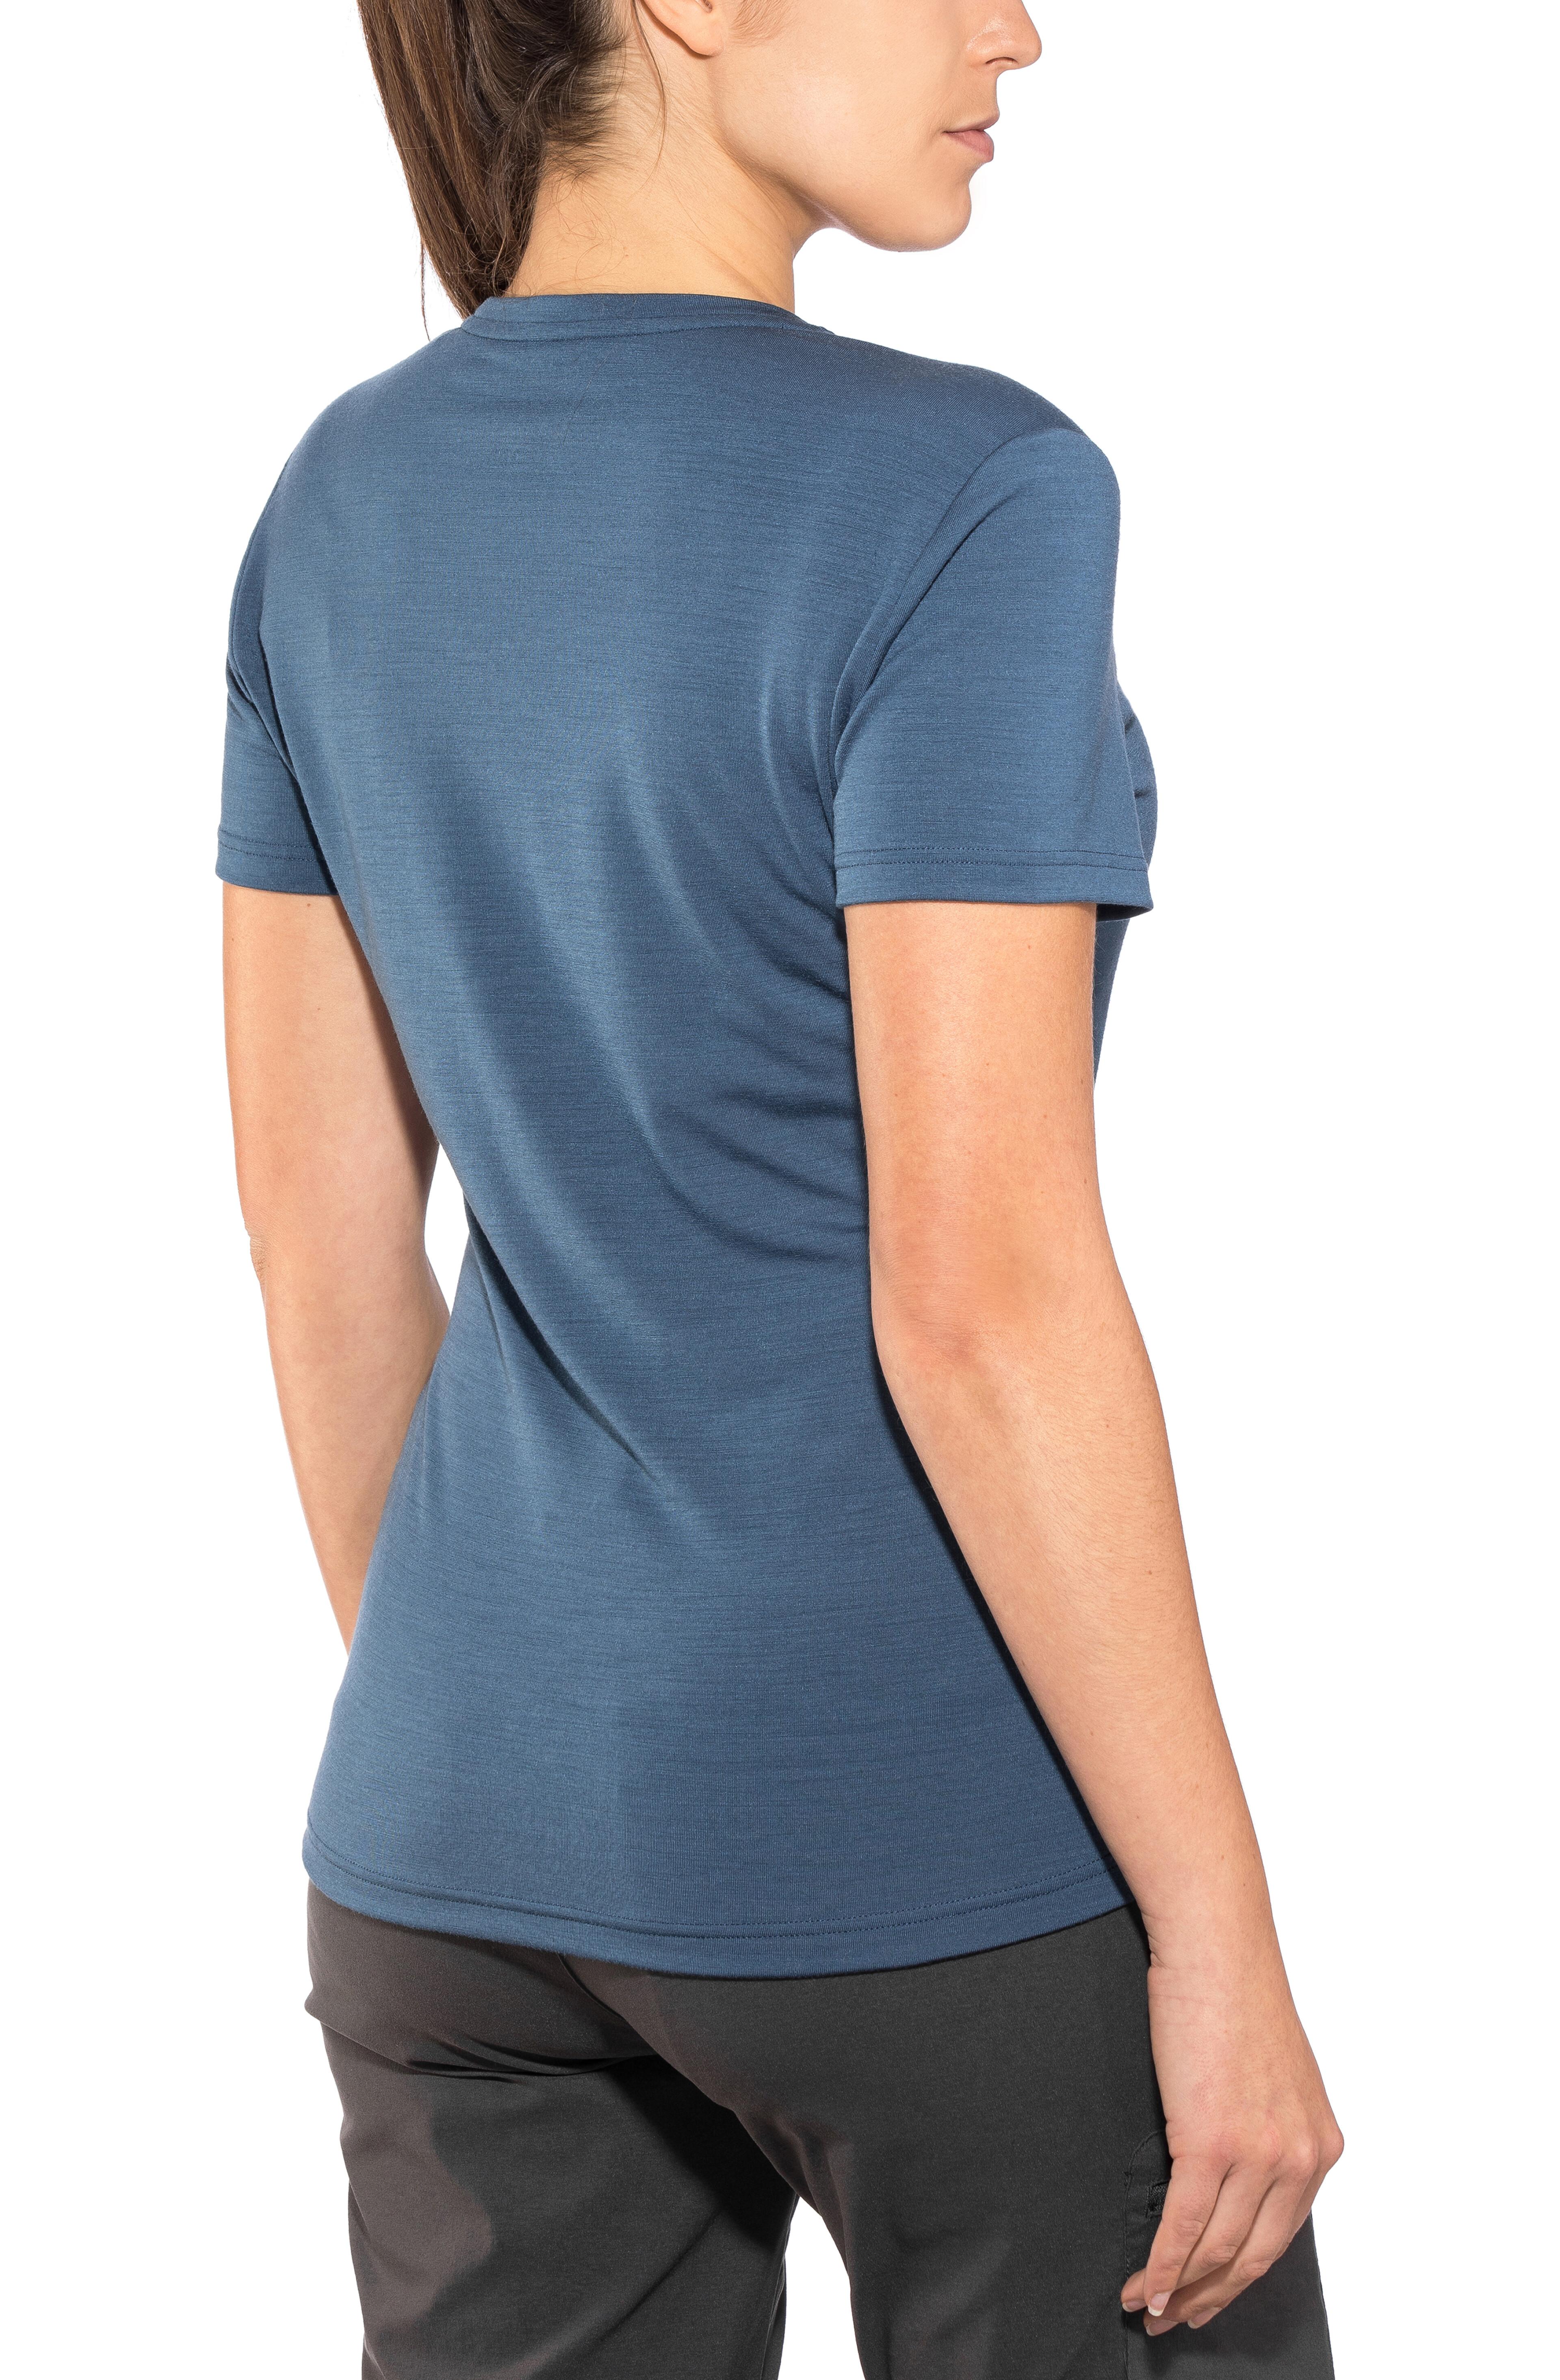 56a42719 Mammut Alvra Shortsleeve Shirt Women blue at Addnature.co.uk